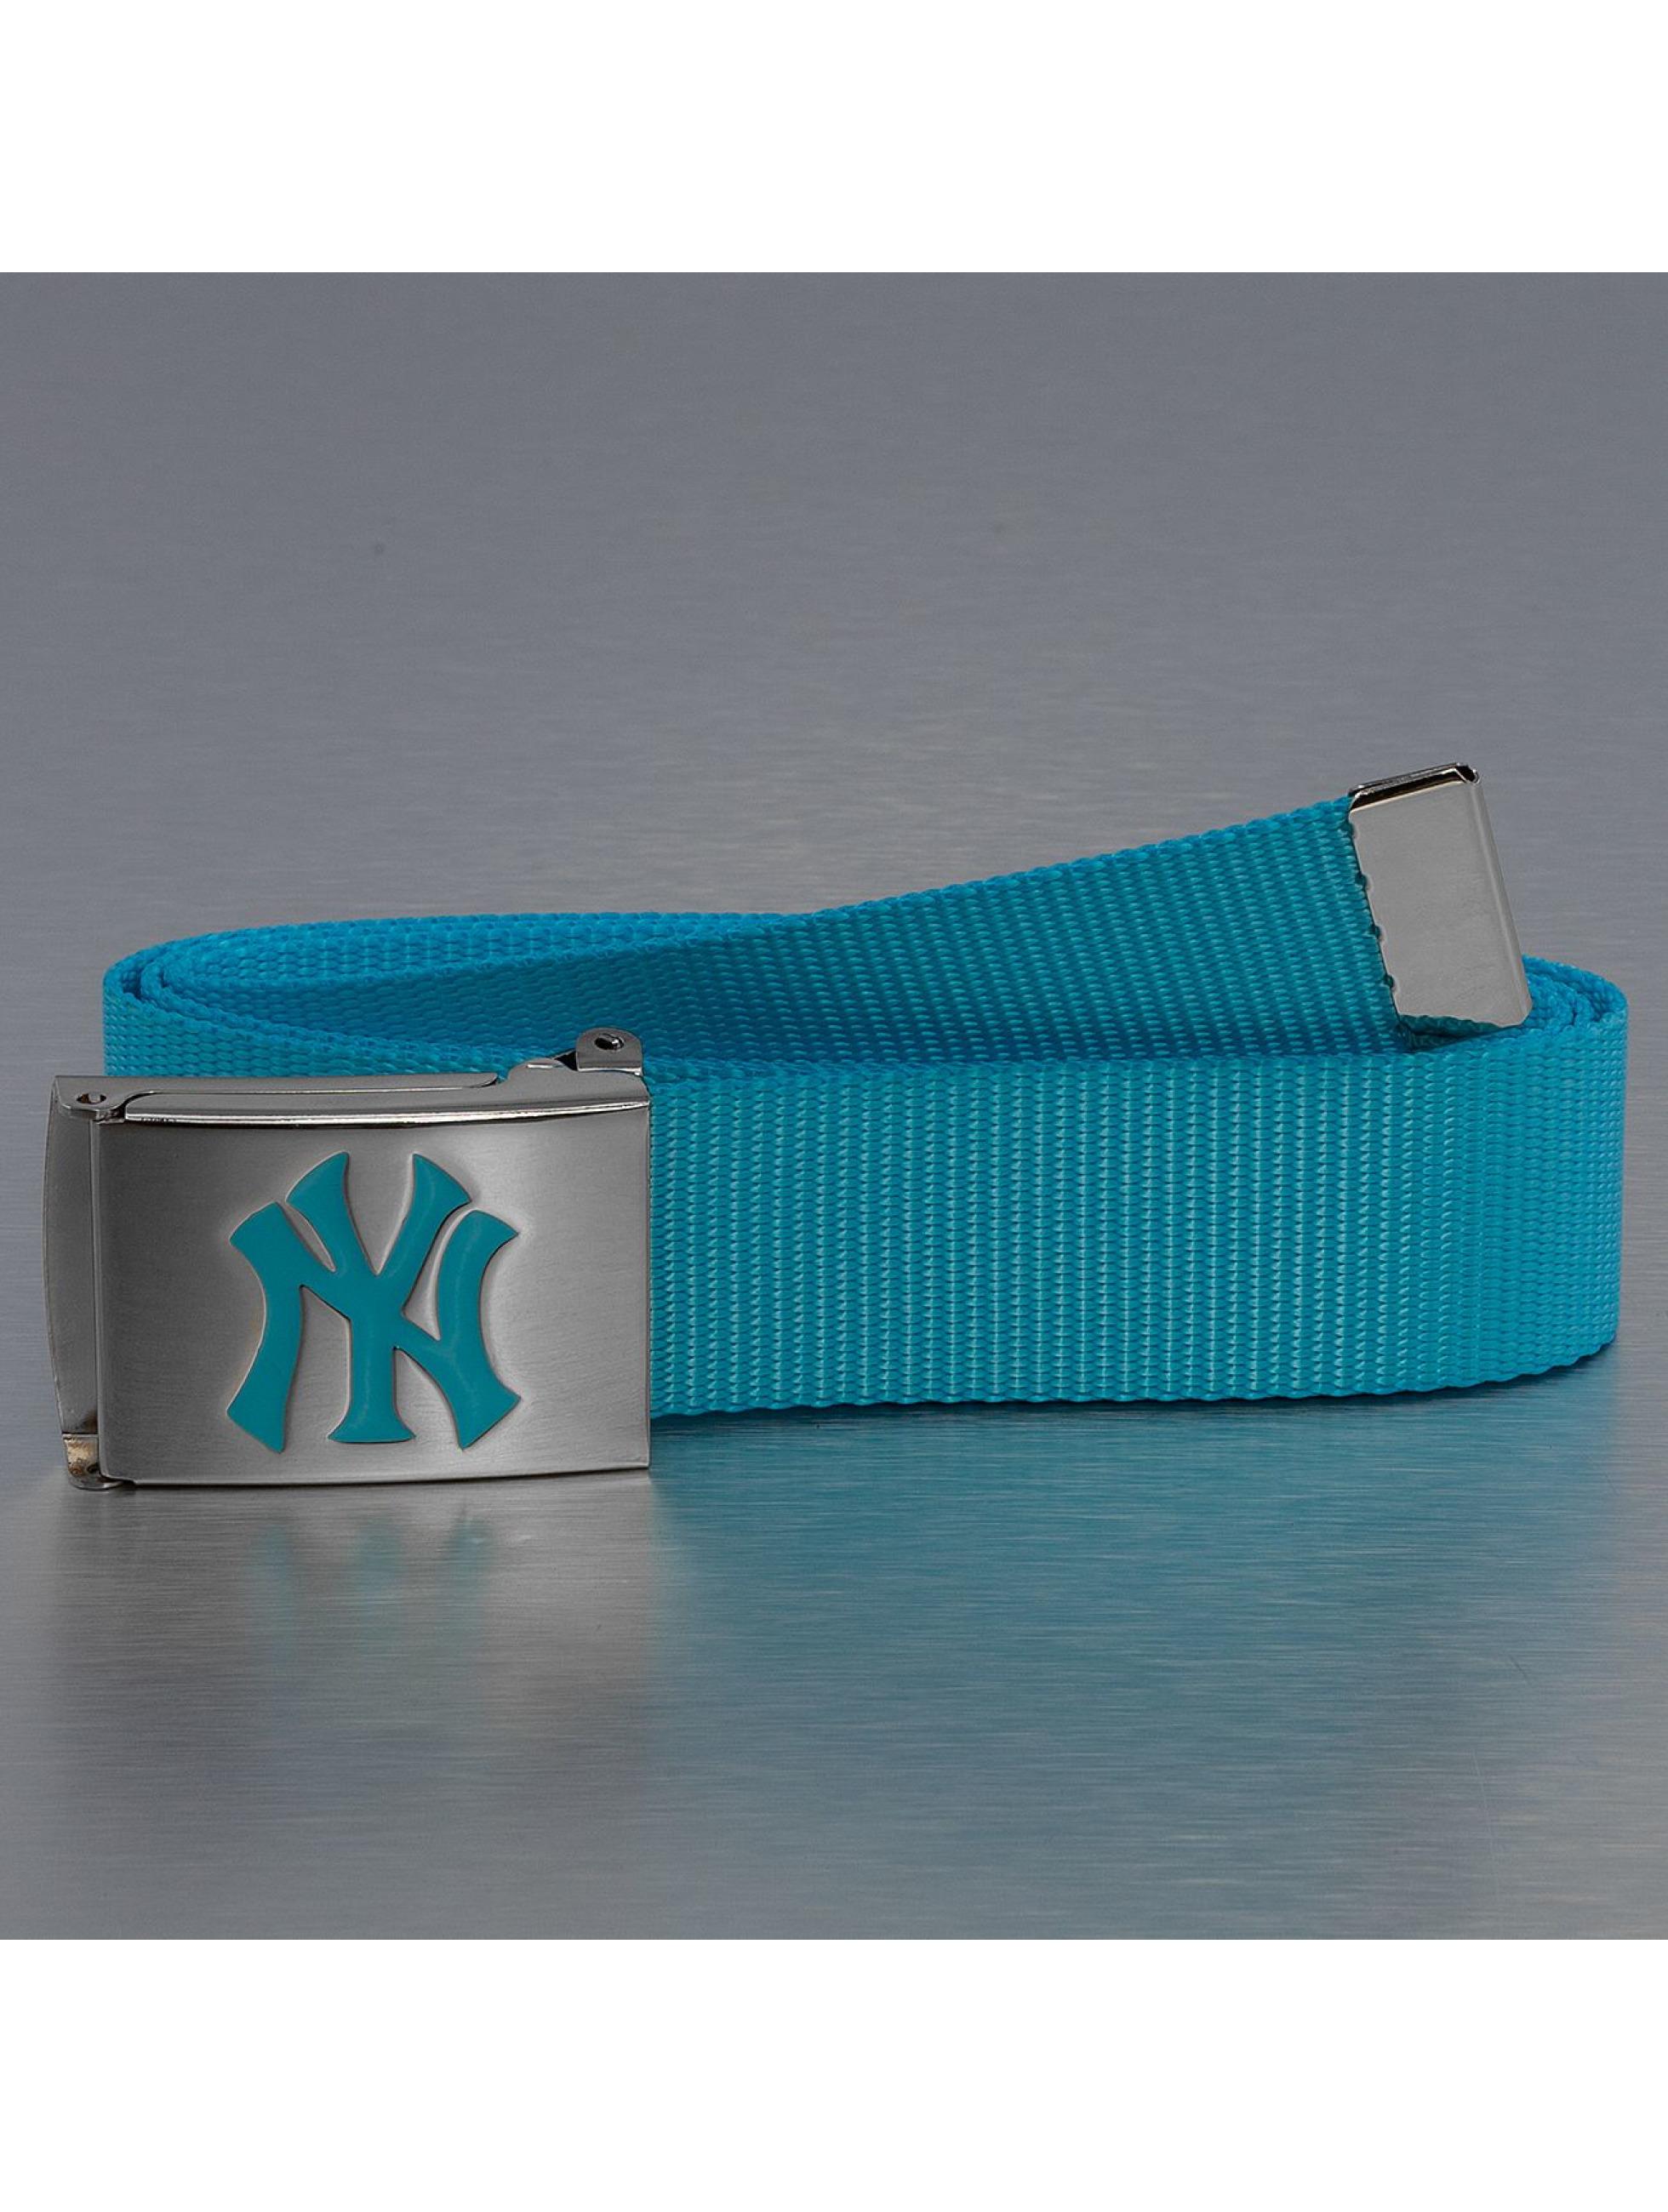 MLB Männer,Frauen Gürtel MLB NY Yankees Premium Woven in türkis